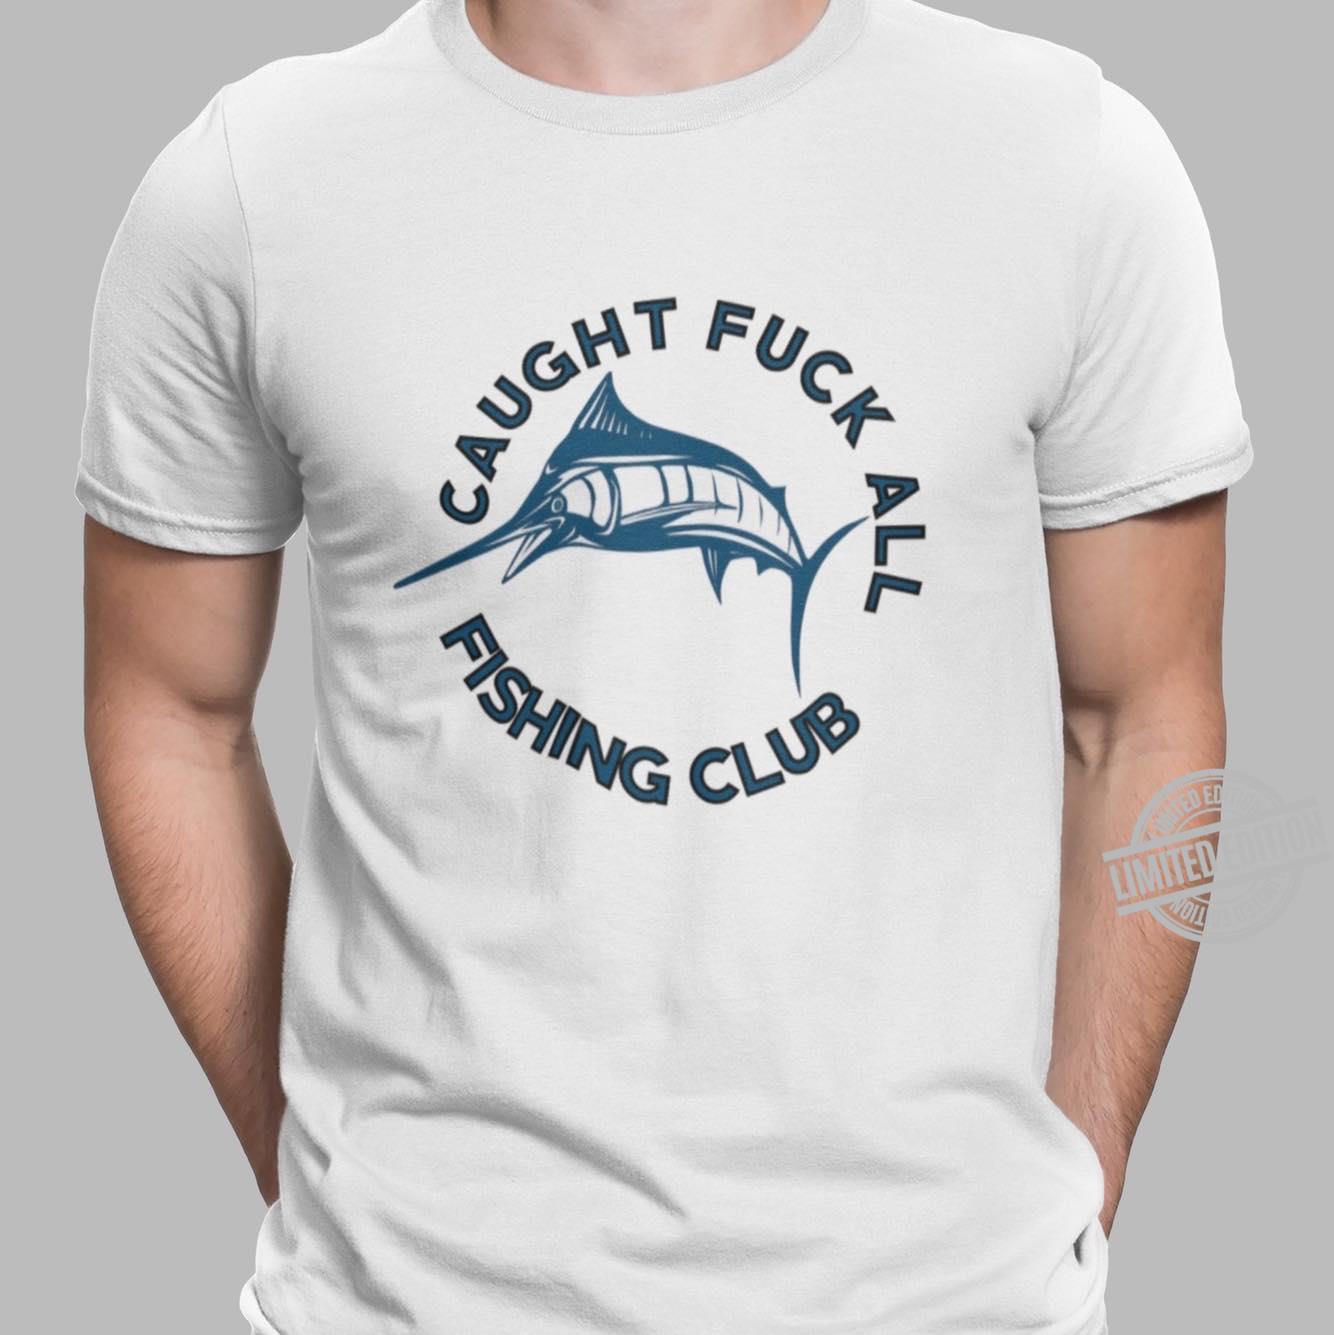 Caught Fuck All Fishing Club Shirt